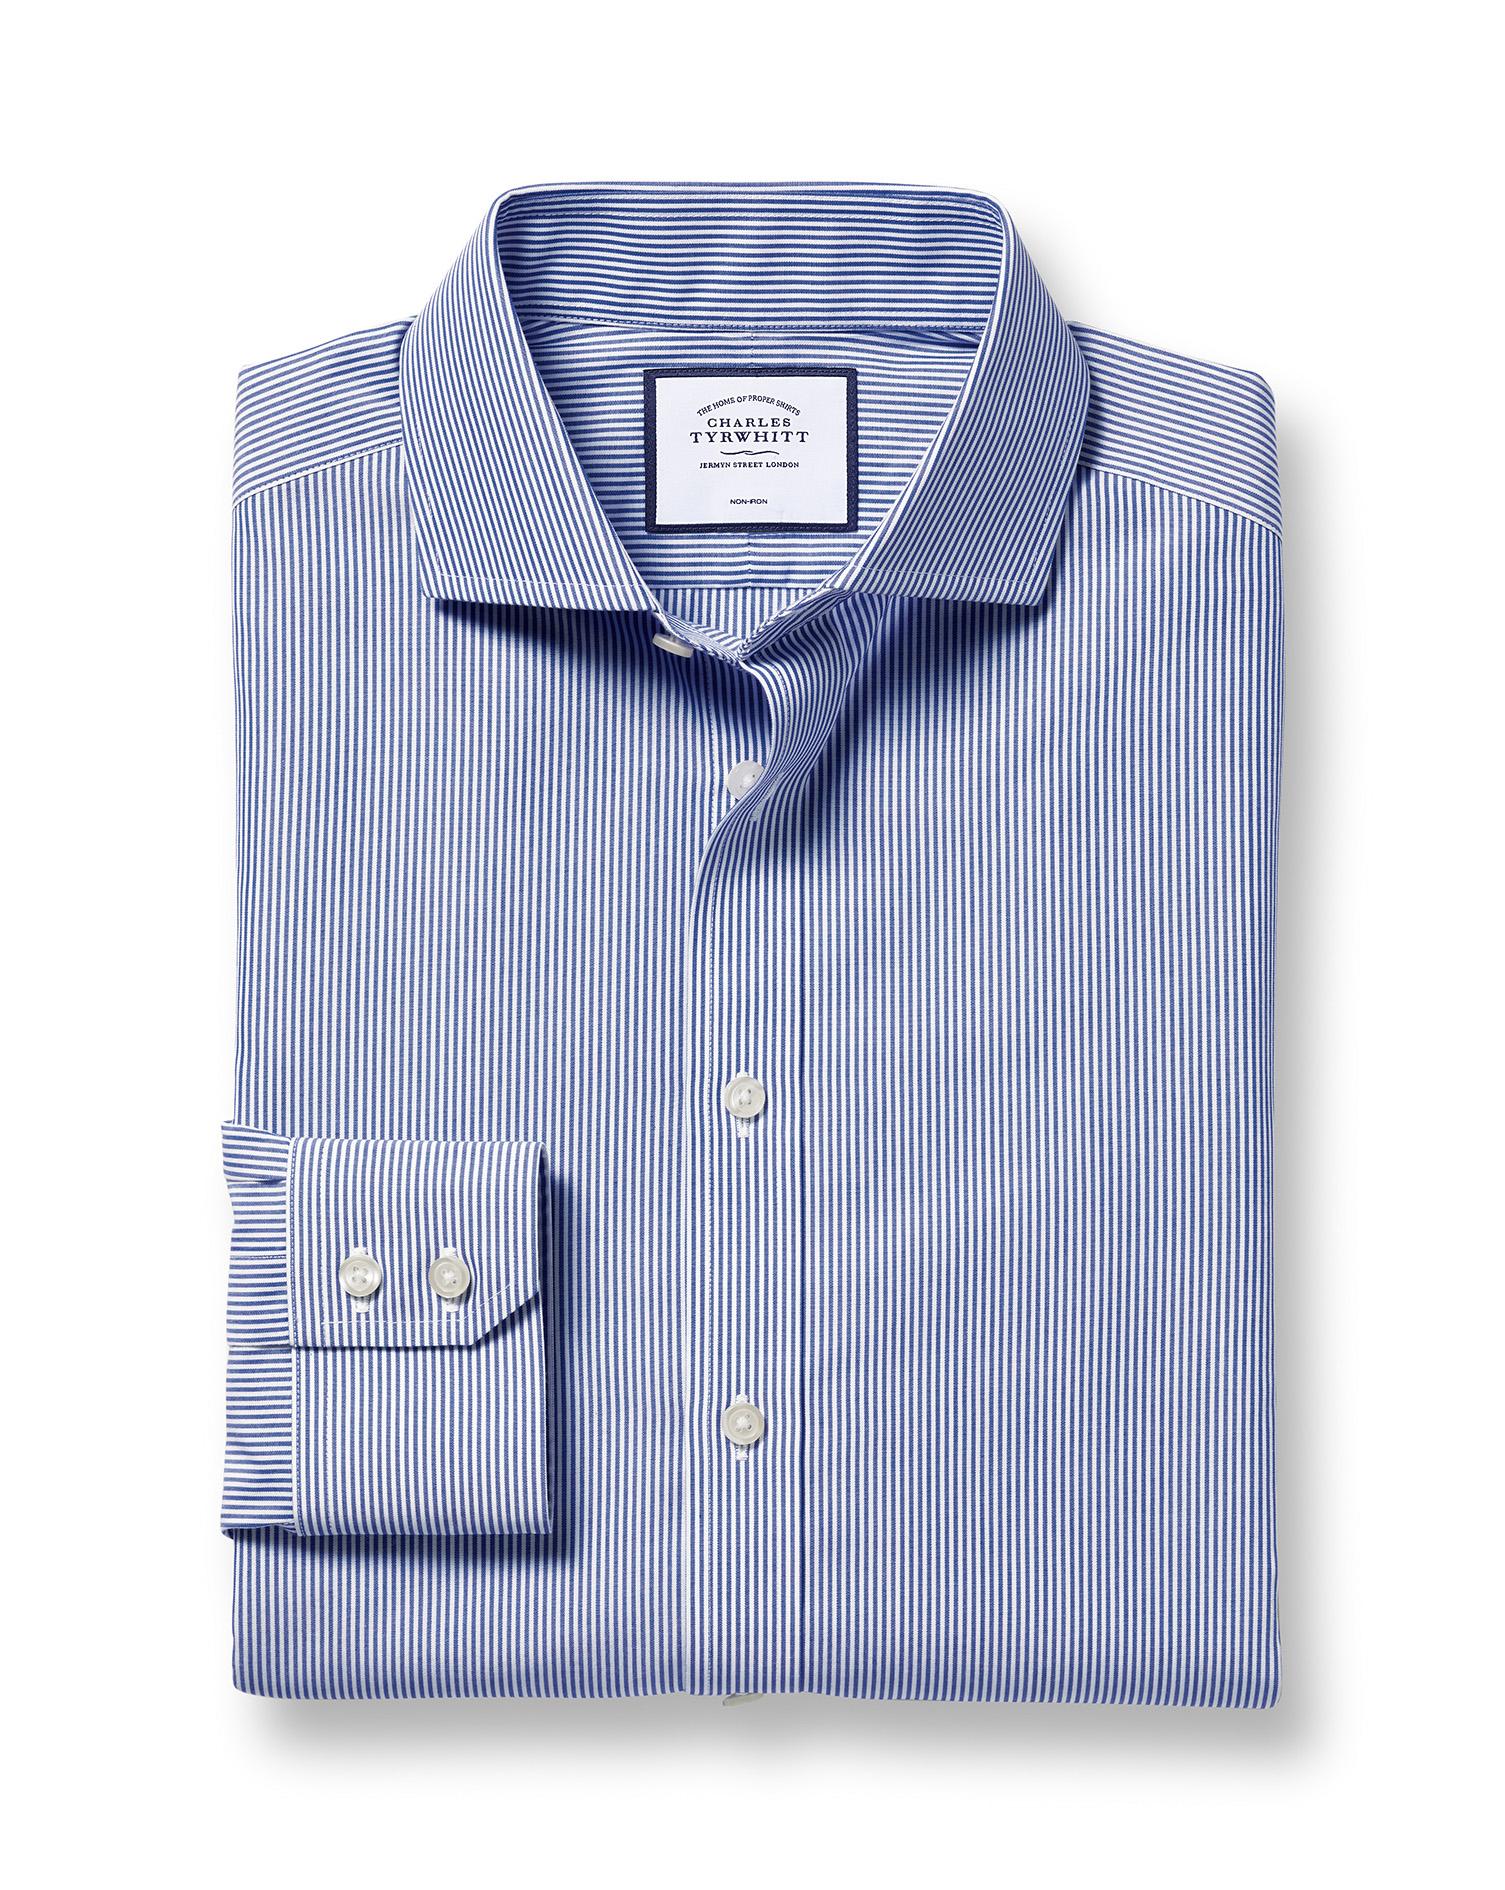 Extra Slim Fit Cutaway Non-Iron Bengal Stripe Navy Blue Cotton Formal Shirt Single Cuff Size 15.5/35